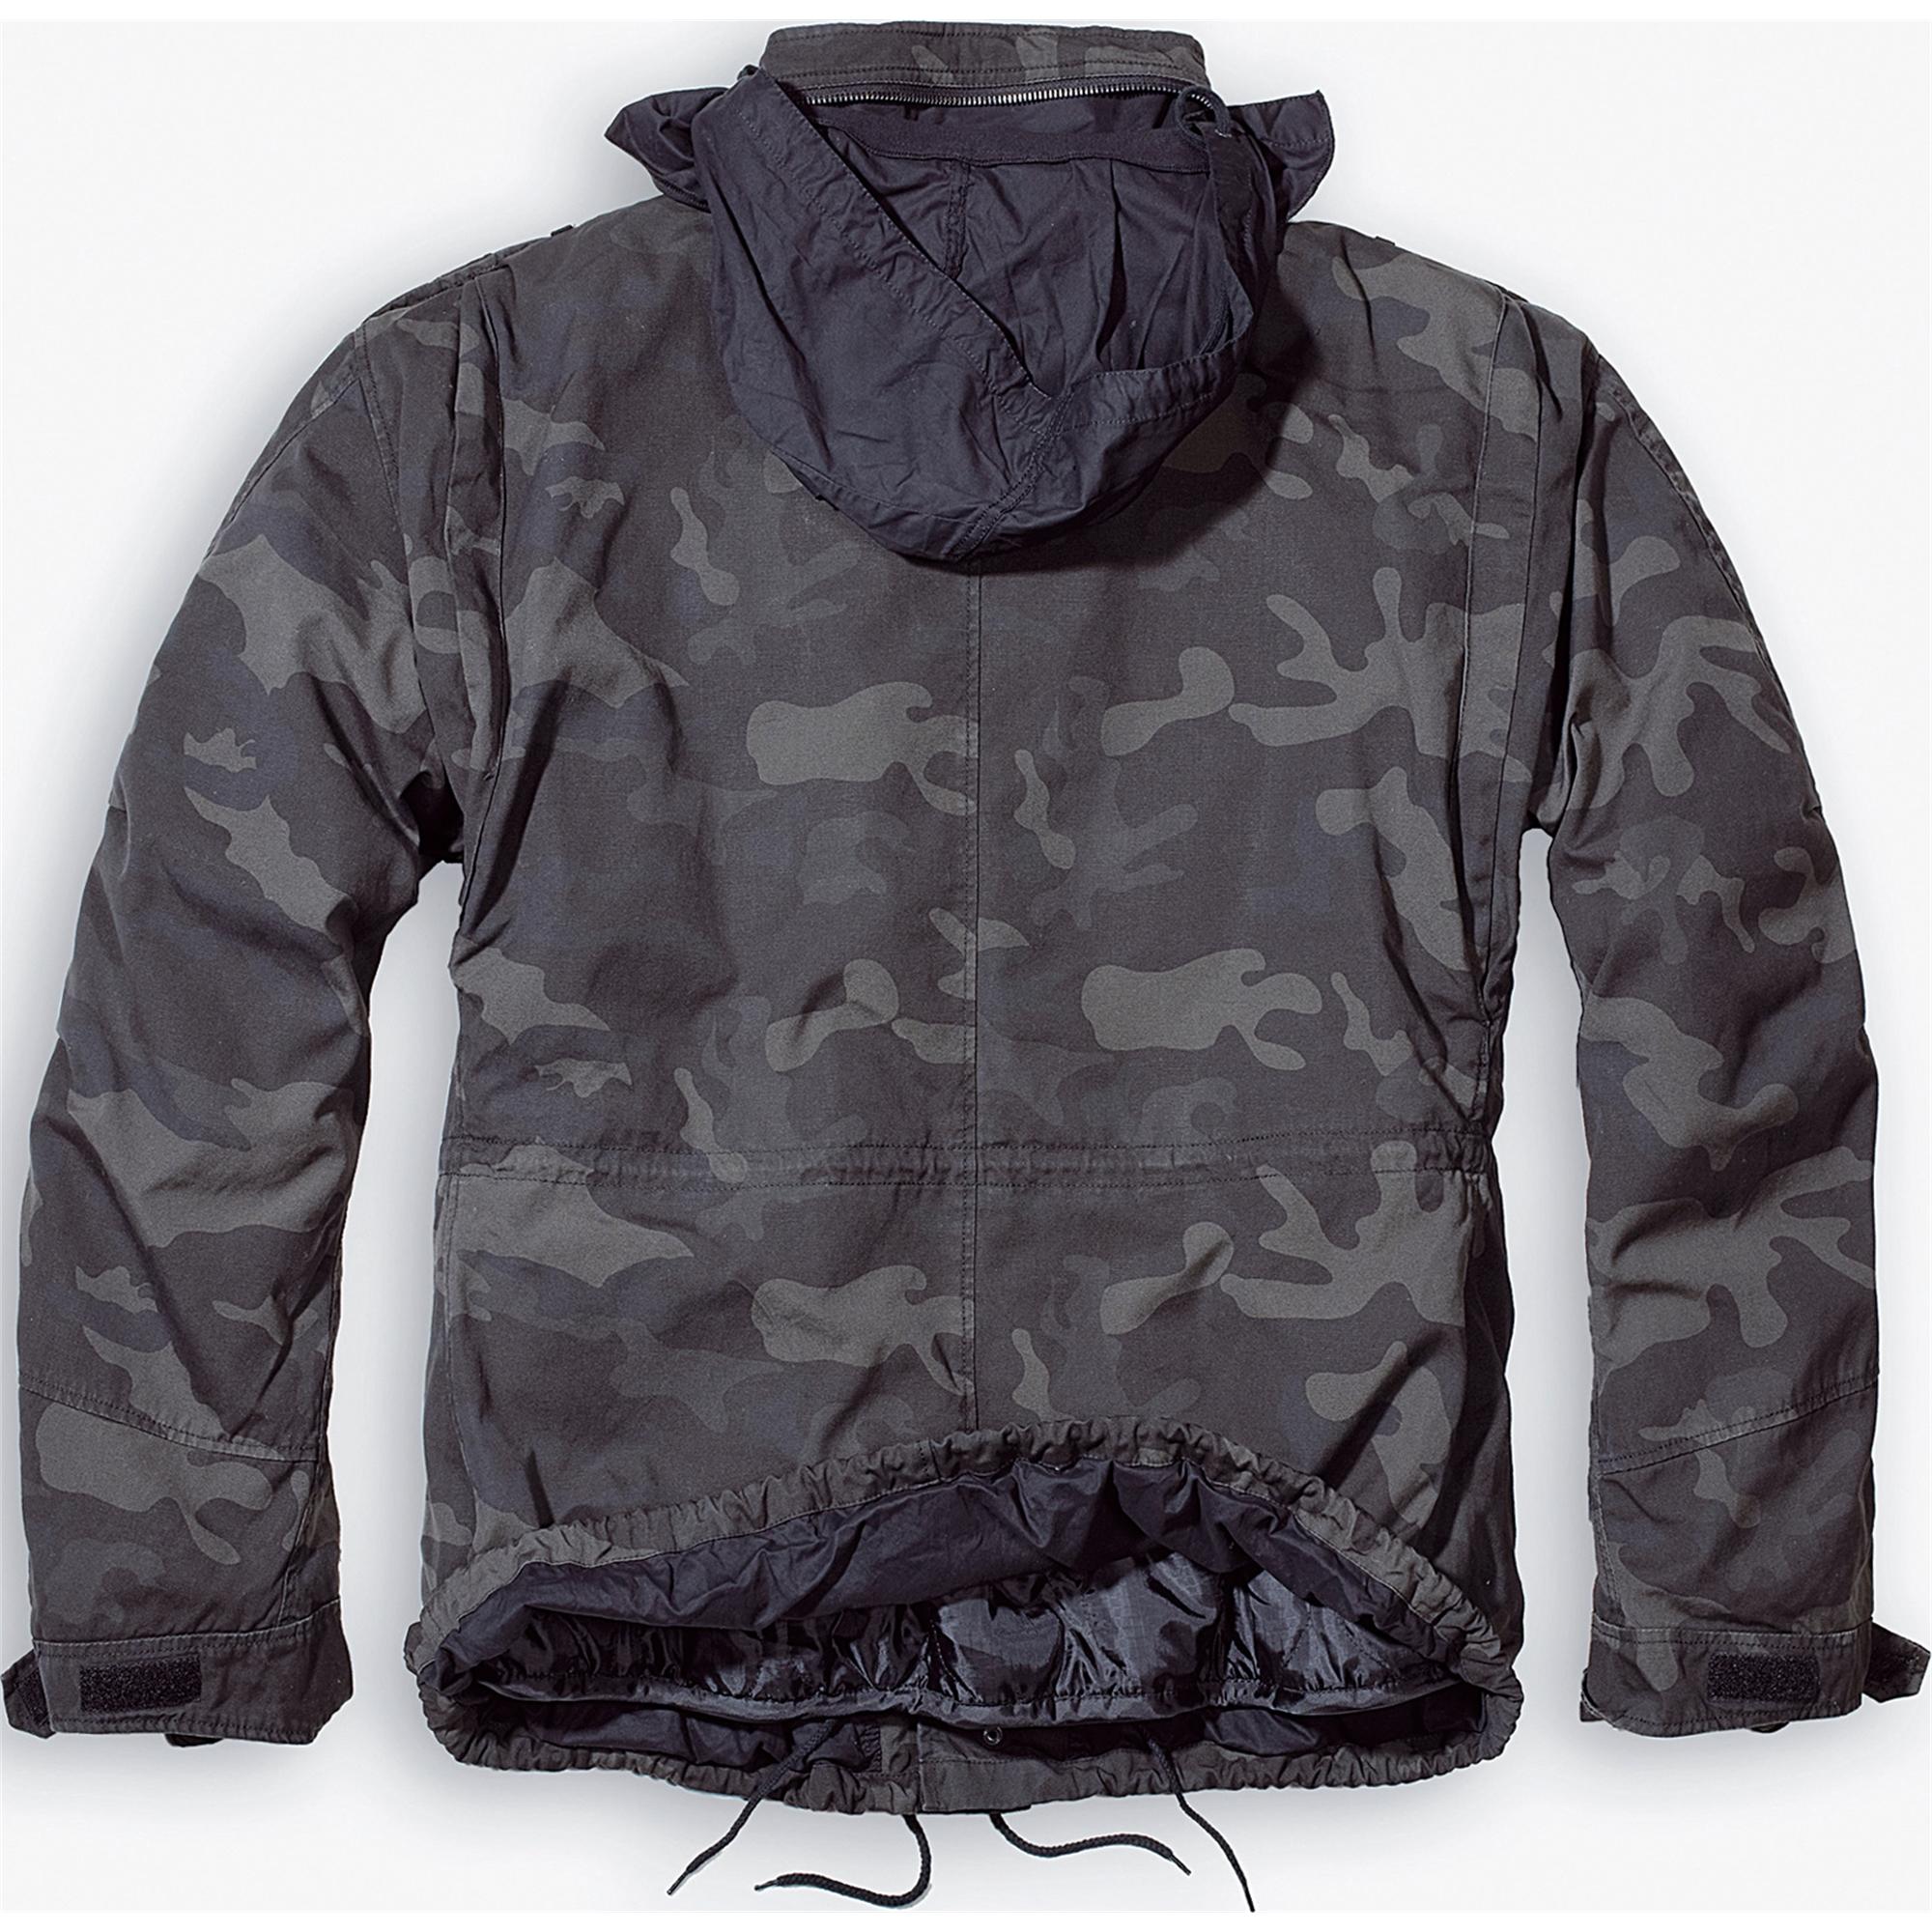 Brandit-M65-Giant-Herren-Jacke-Vintage-Feldjacke-Army-Outdoor-Parka-Futter-S-7XL Indexbild 15